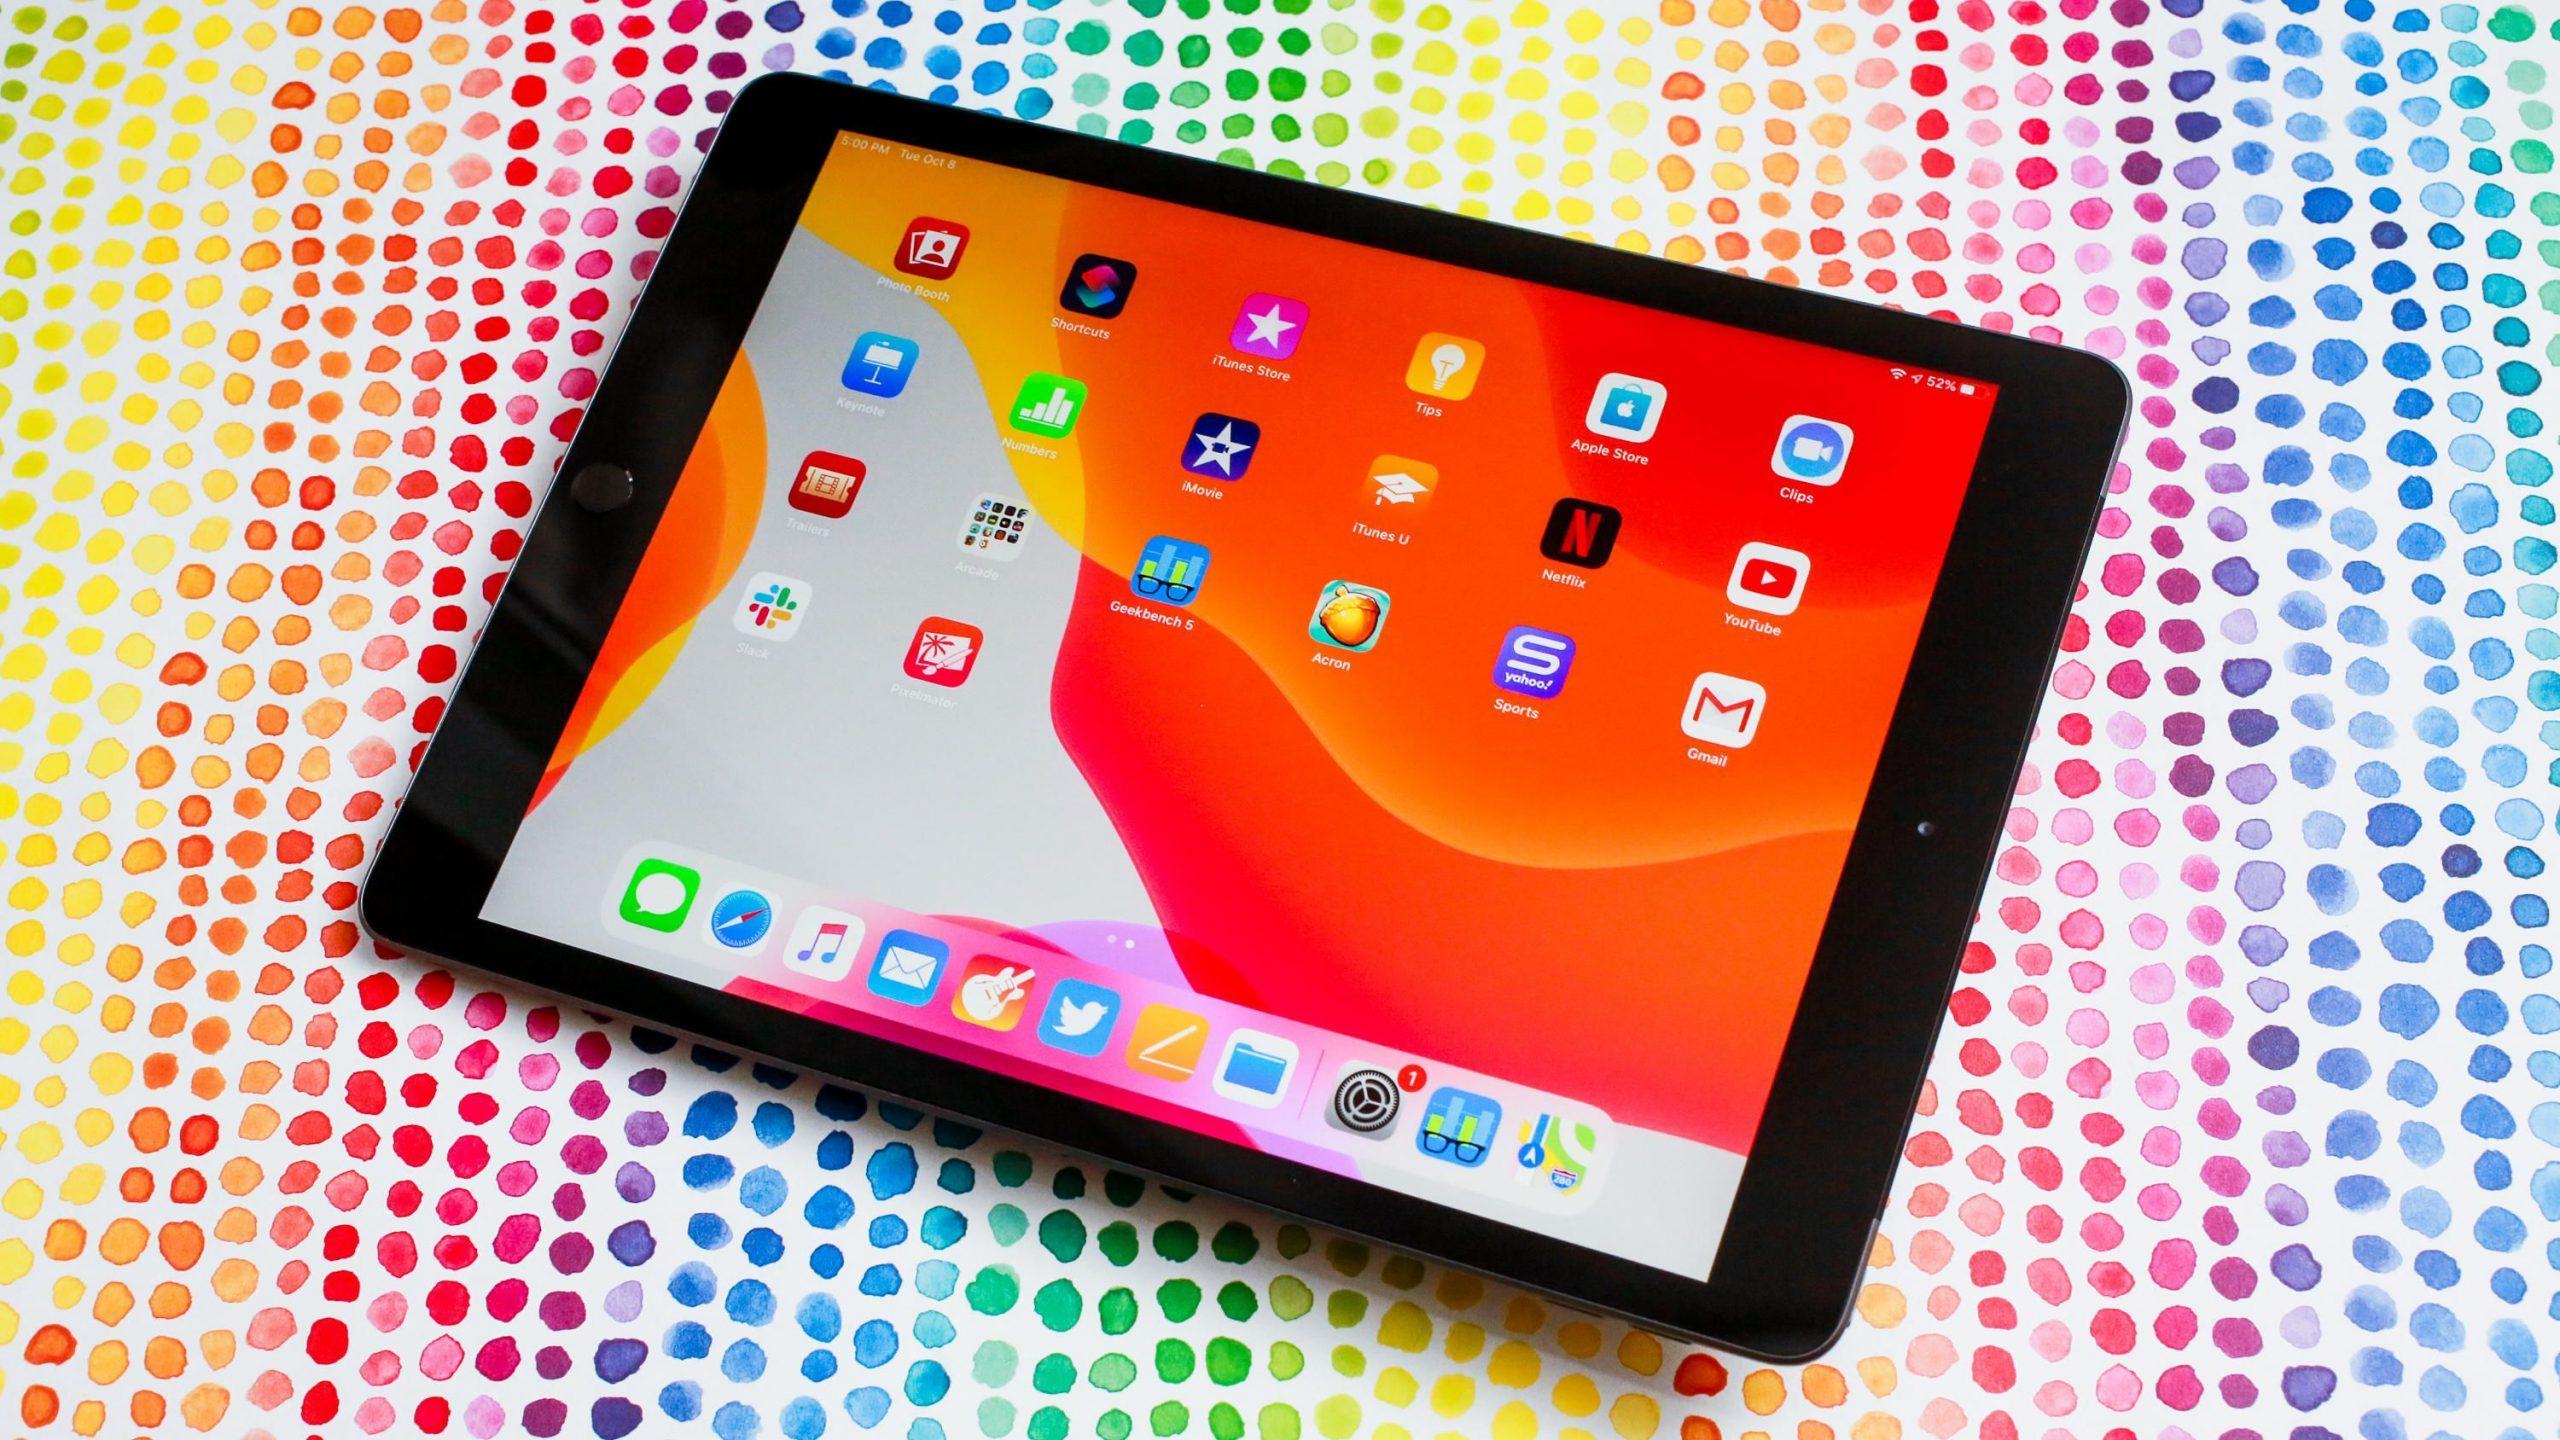 تعویض گلس شکسته آیپد Pro 12.9 2015 | گارانتی اپل